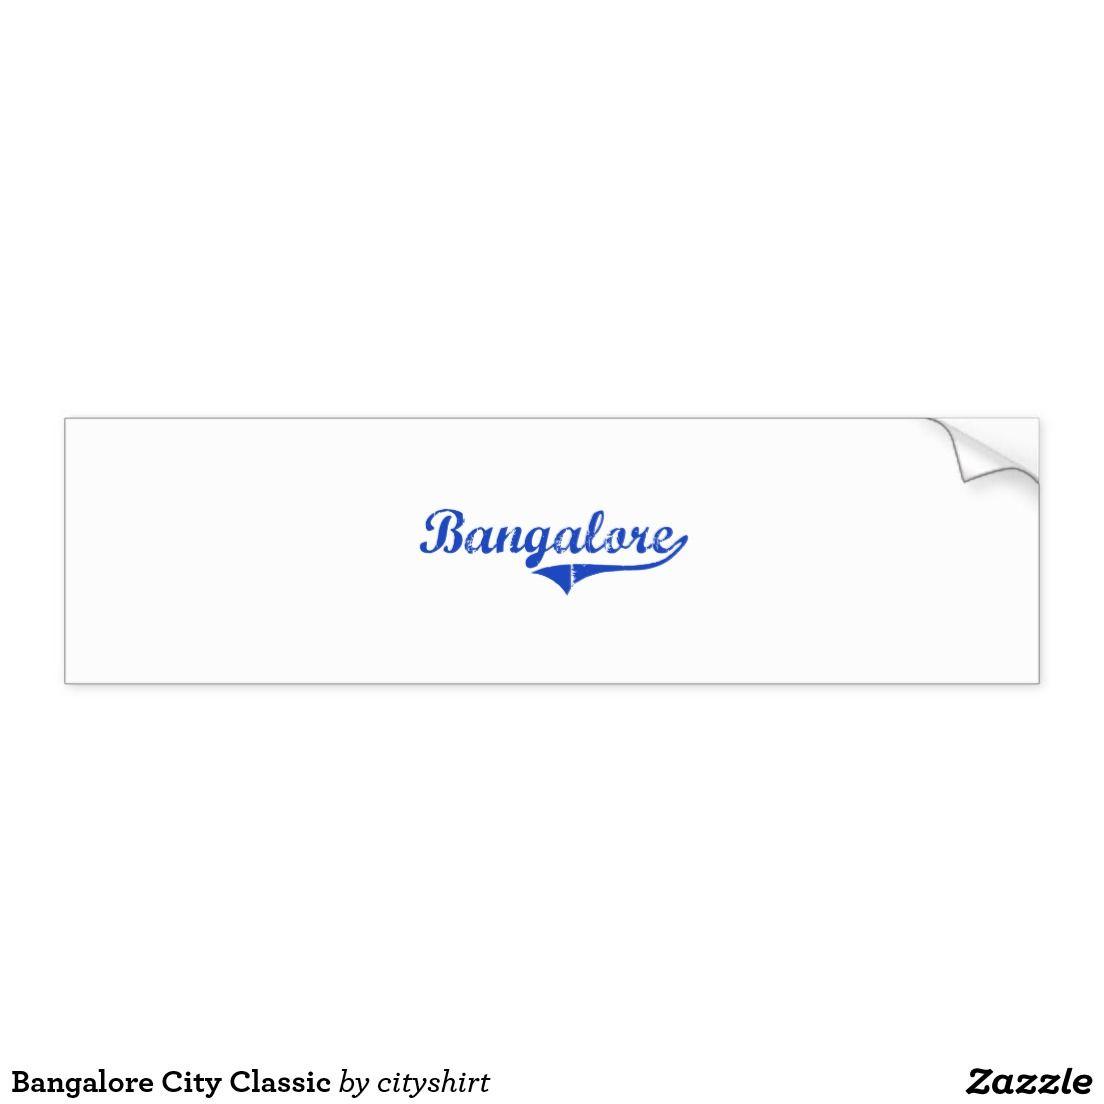 Bangalore City Classic Bumper Sticker Zazzle Com Bumper Stickers Bumpers Strong Adhesive [ 1104 x 1104 Pixel ]